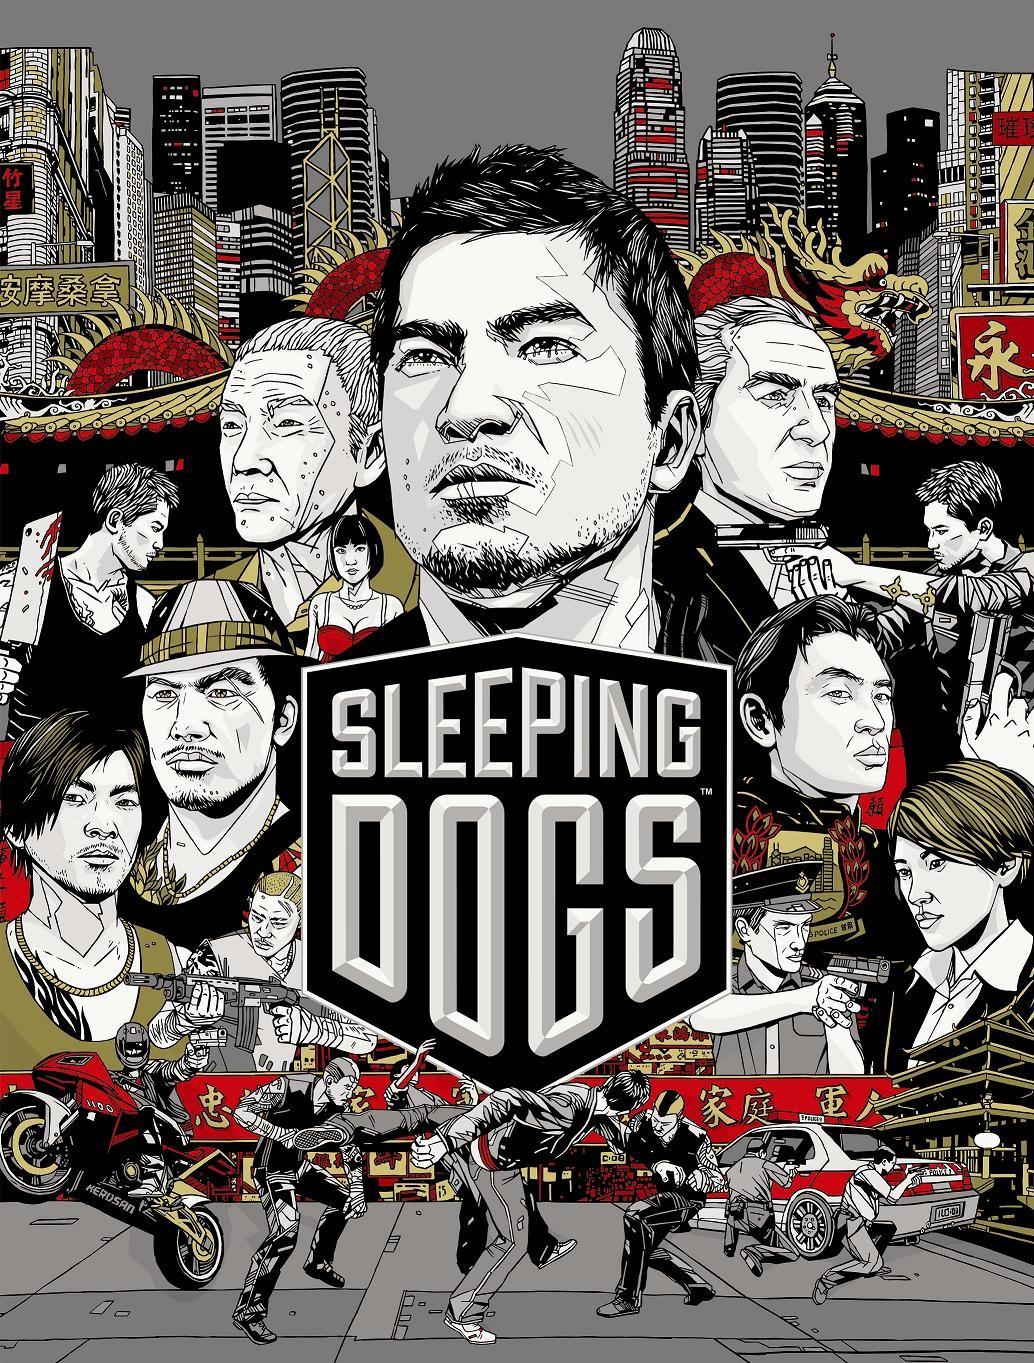 Download Sleeping Dogs Wallpaper 1034x1363 Wallpoper 400320 1034x1363